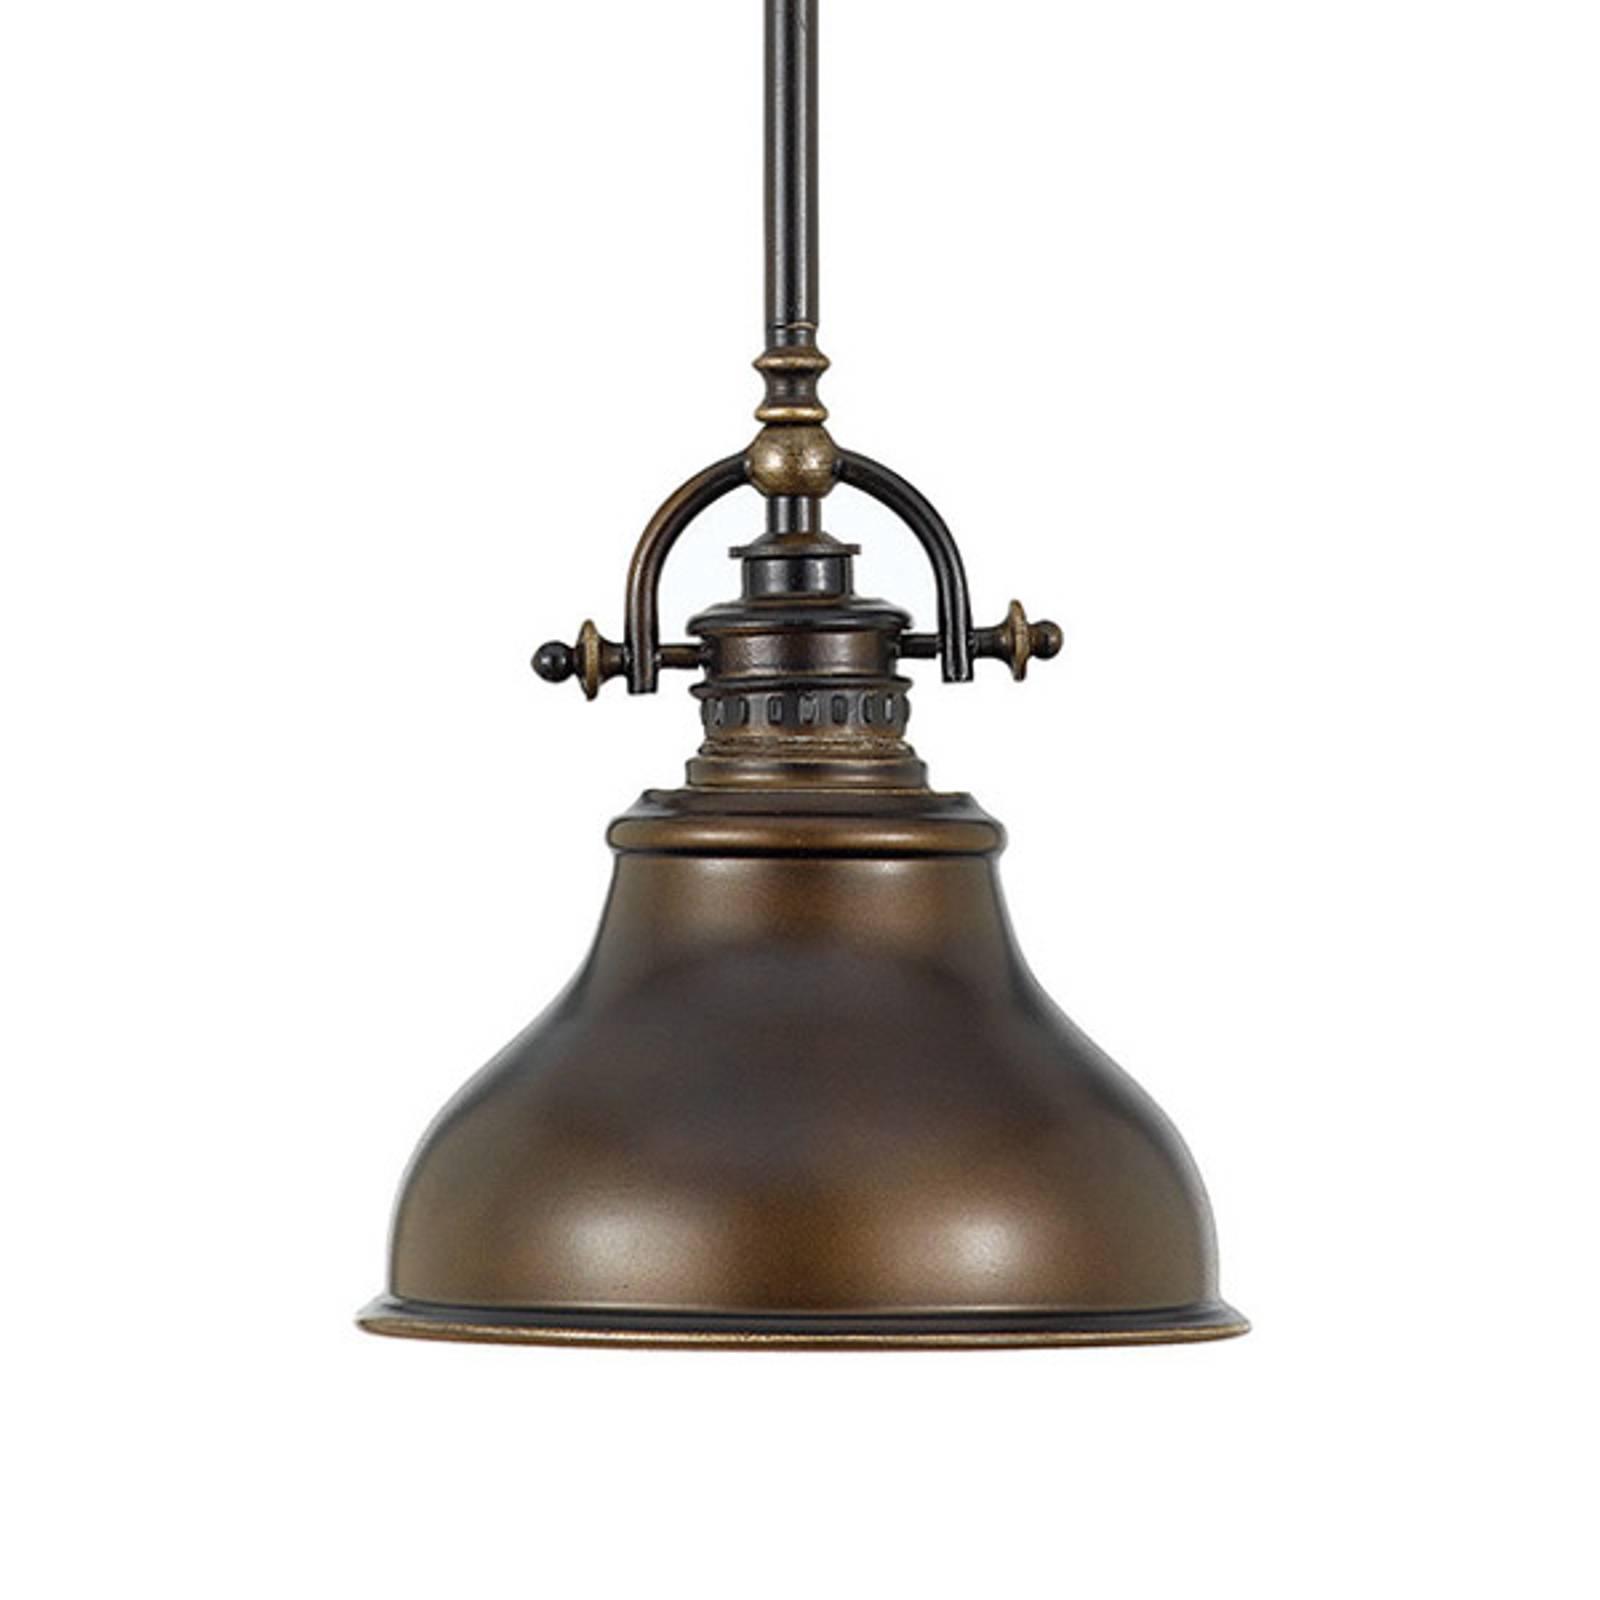 Hanglamp Emery in industriële stijl brons Ø 20,3cm